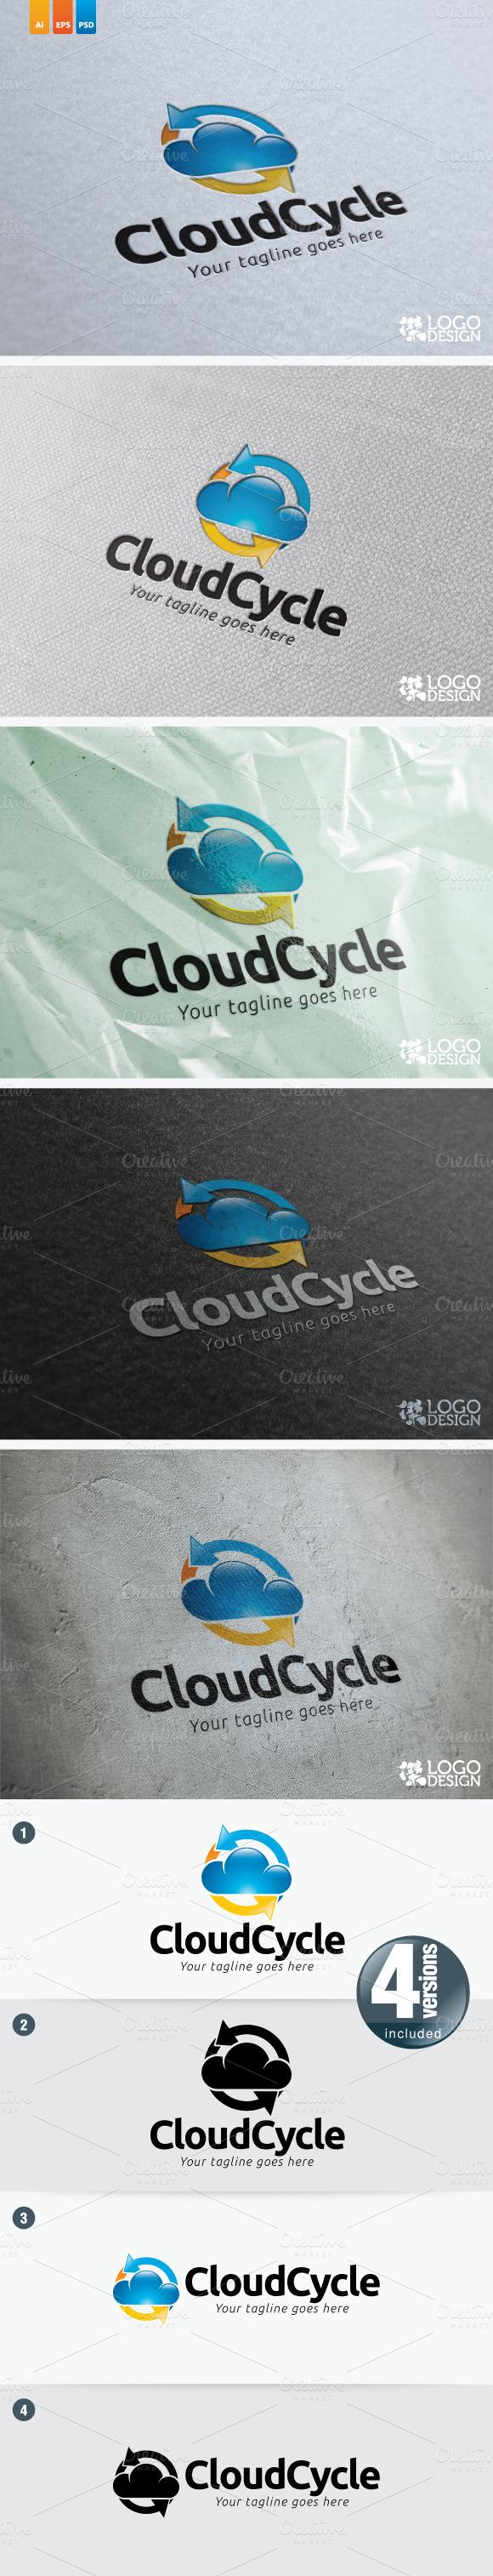 Cloud Cycle